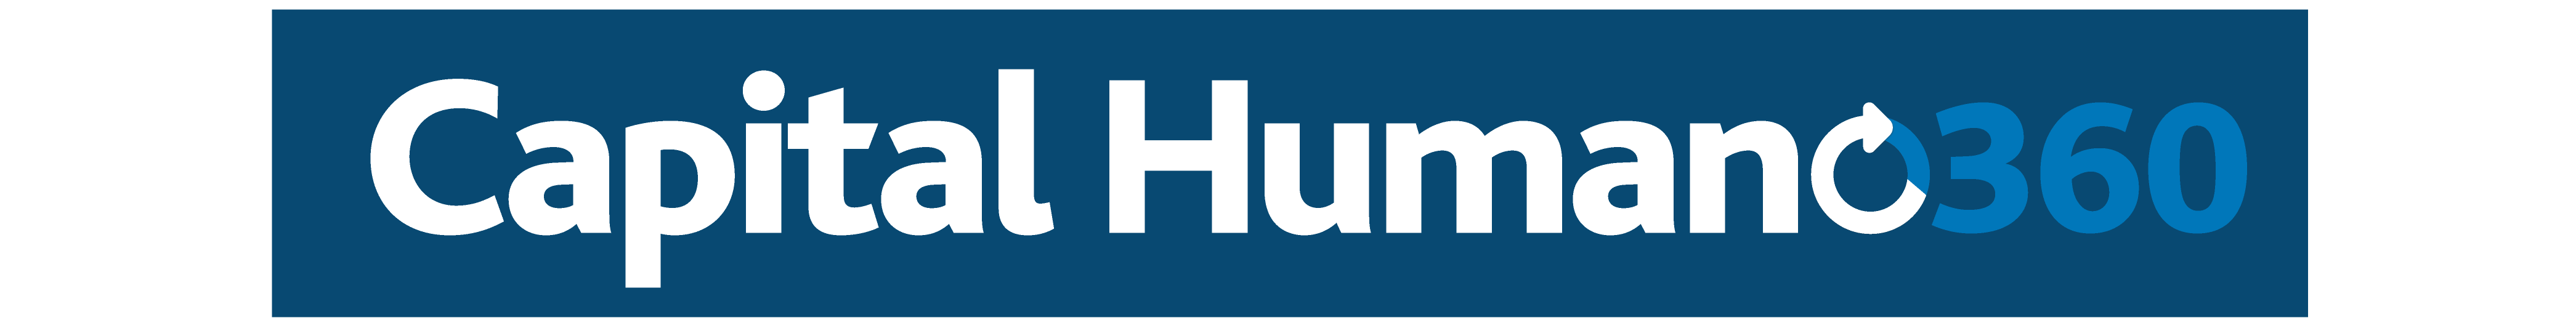 Capital Humano360